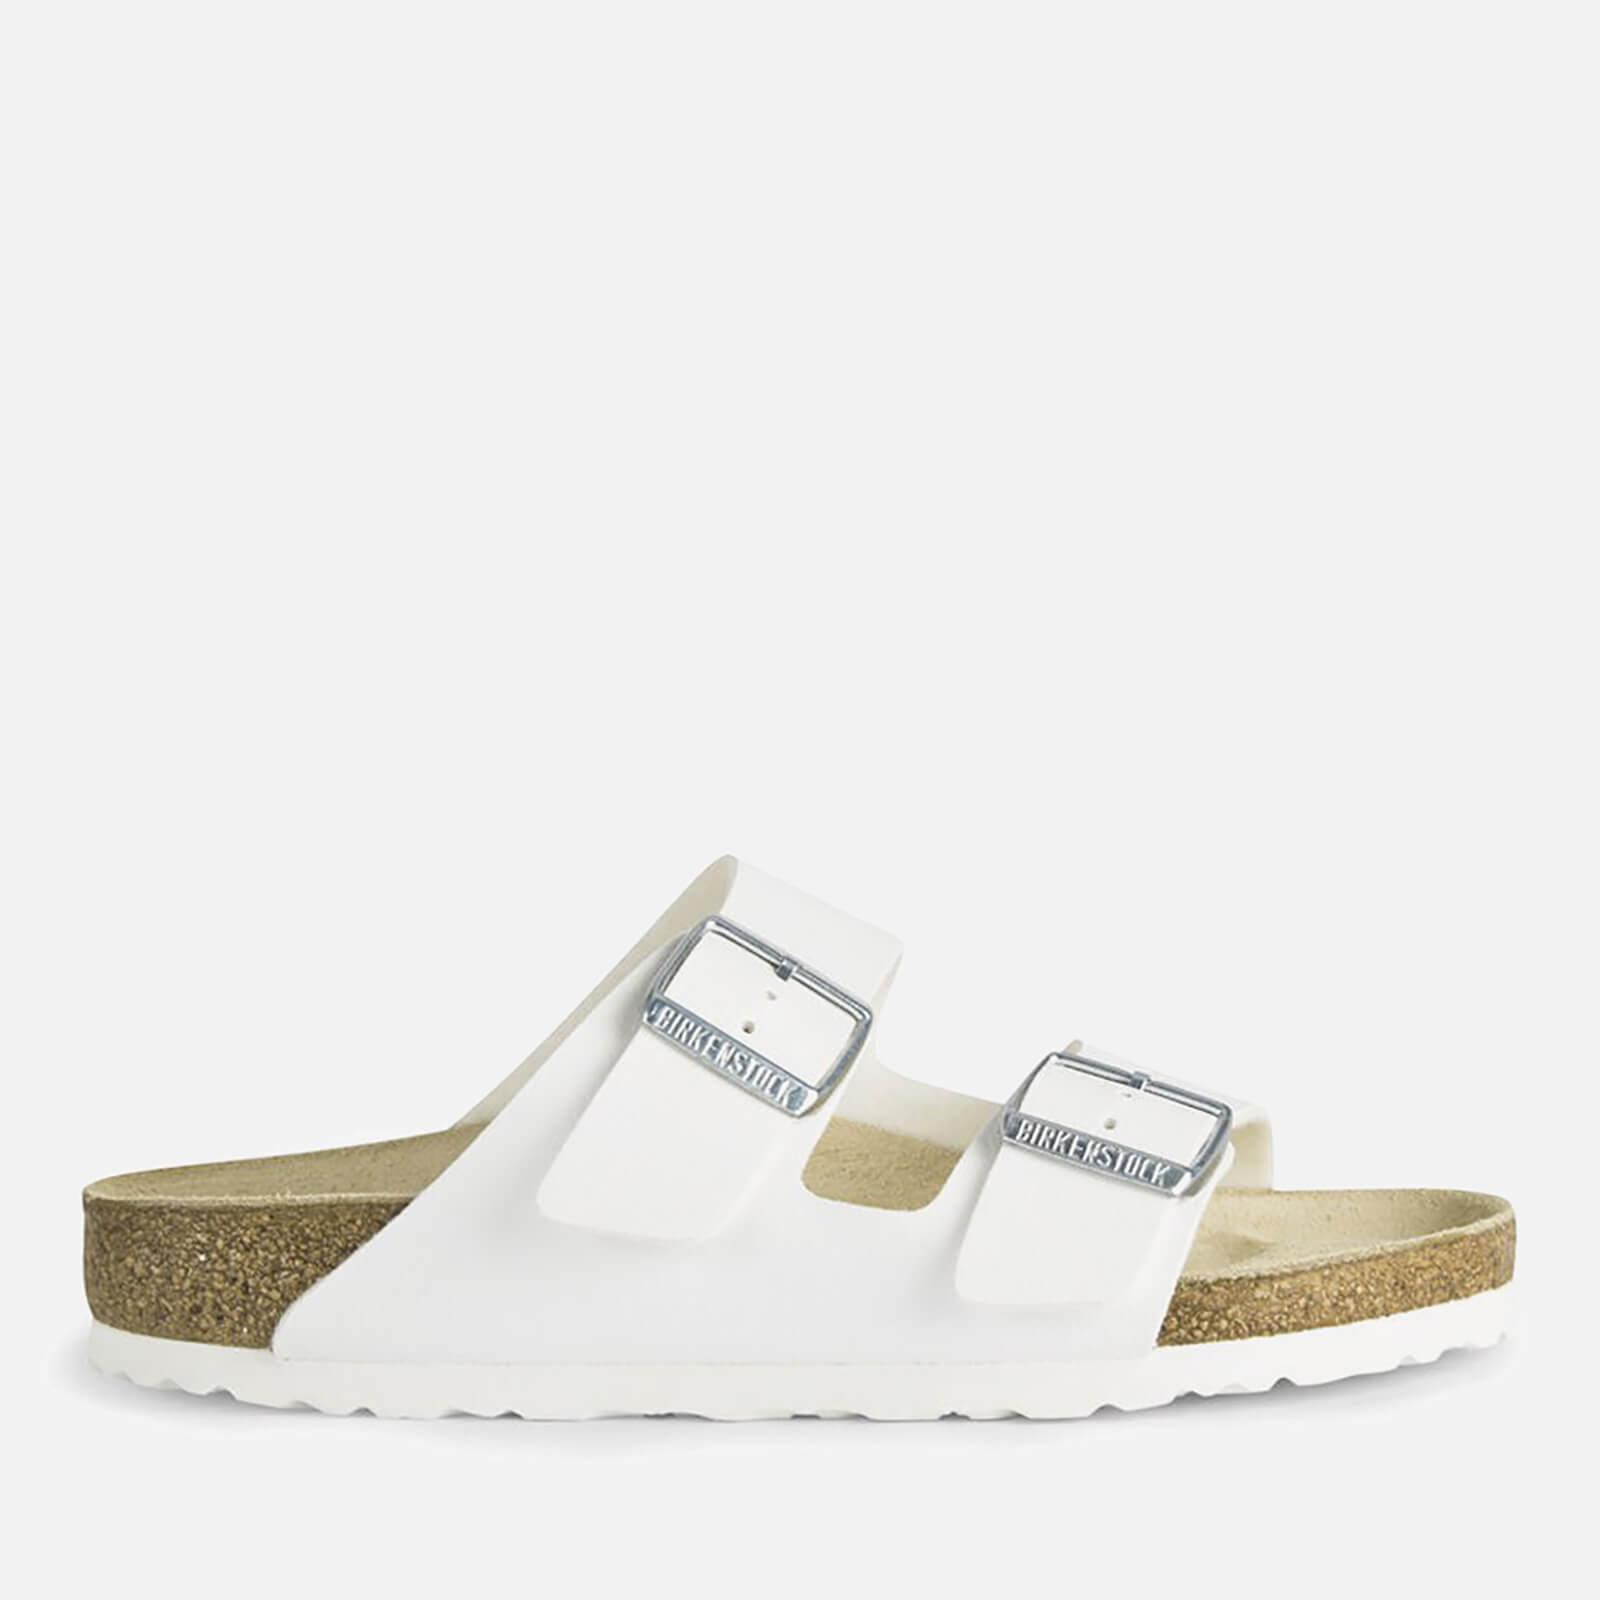 Birkenstock Women's Arizona Slim Fit Double Strap Sandals - White - EU 41/UK 7.5